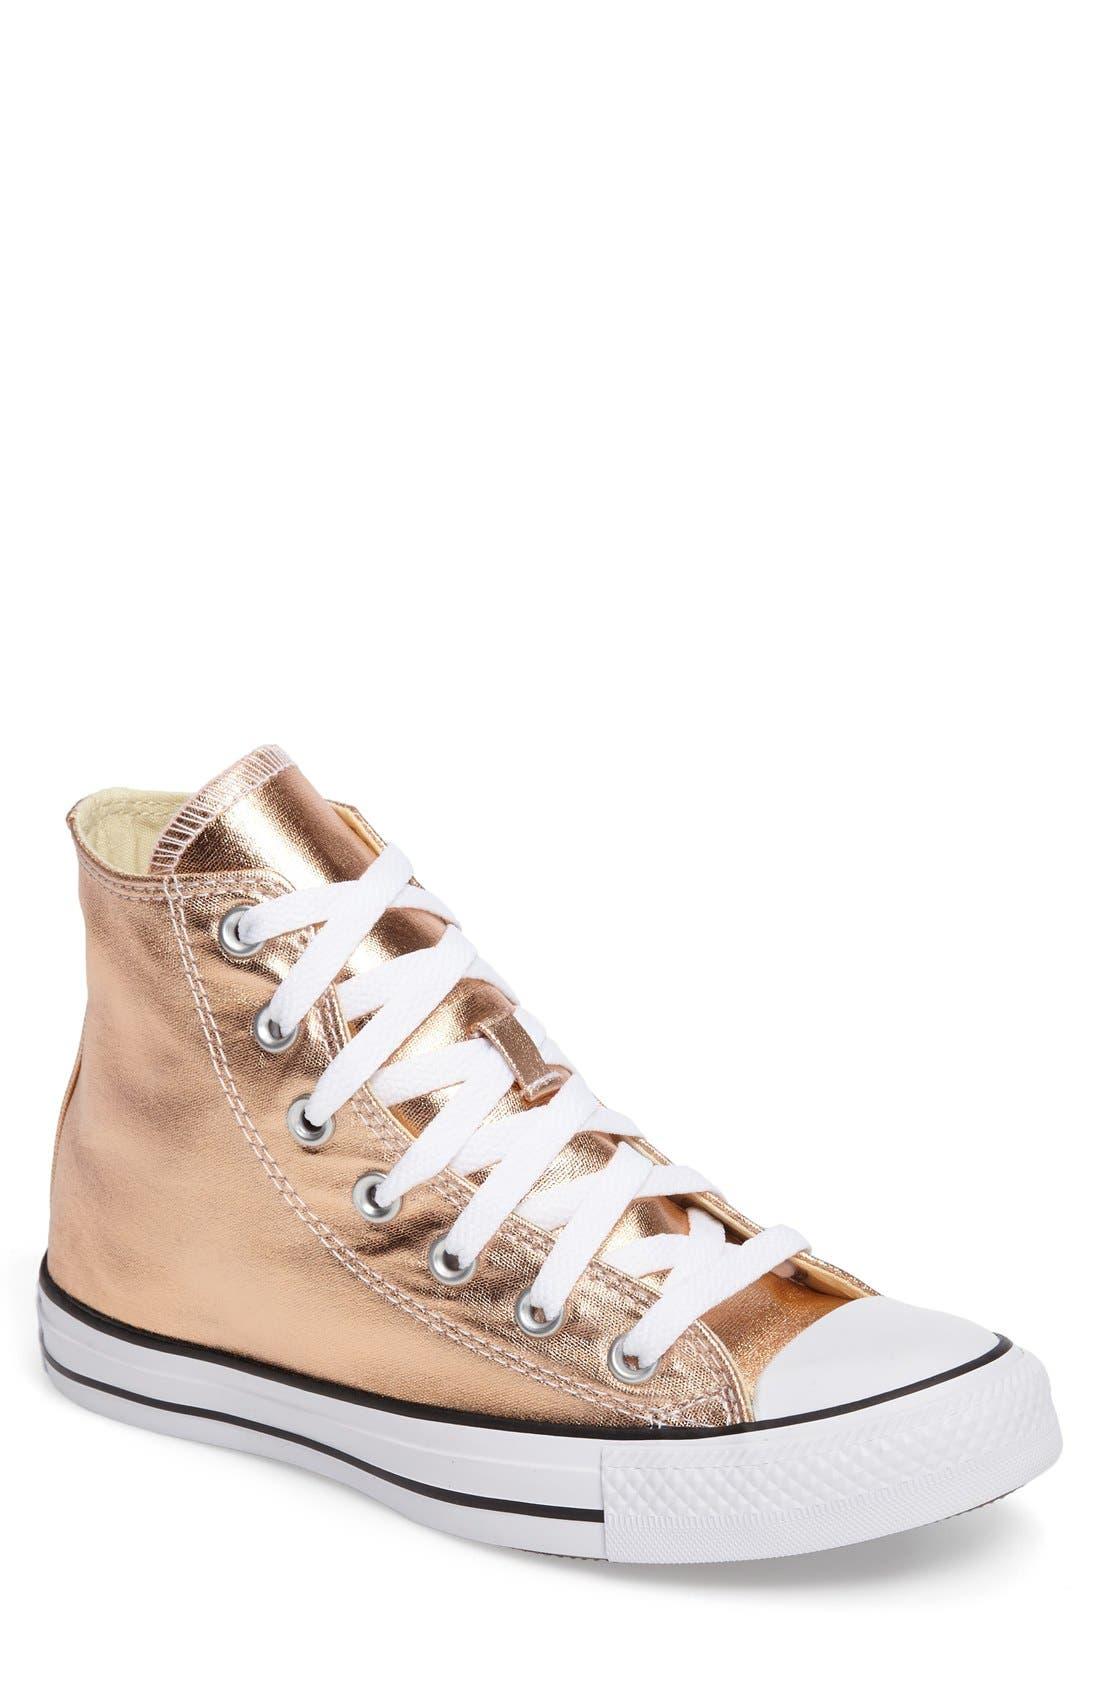 Main Image - Converse Chuck Taylor® All Star® Metallic High Top Sneaker (Women)